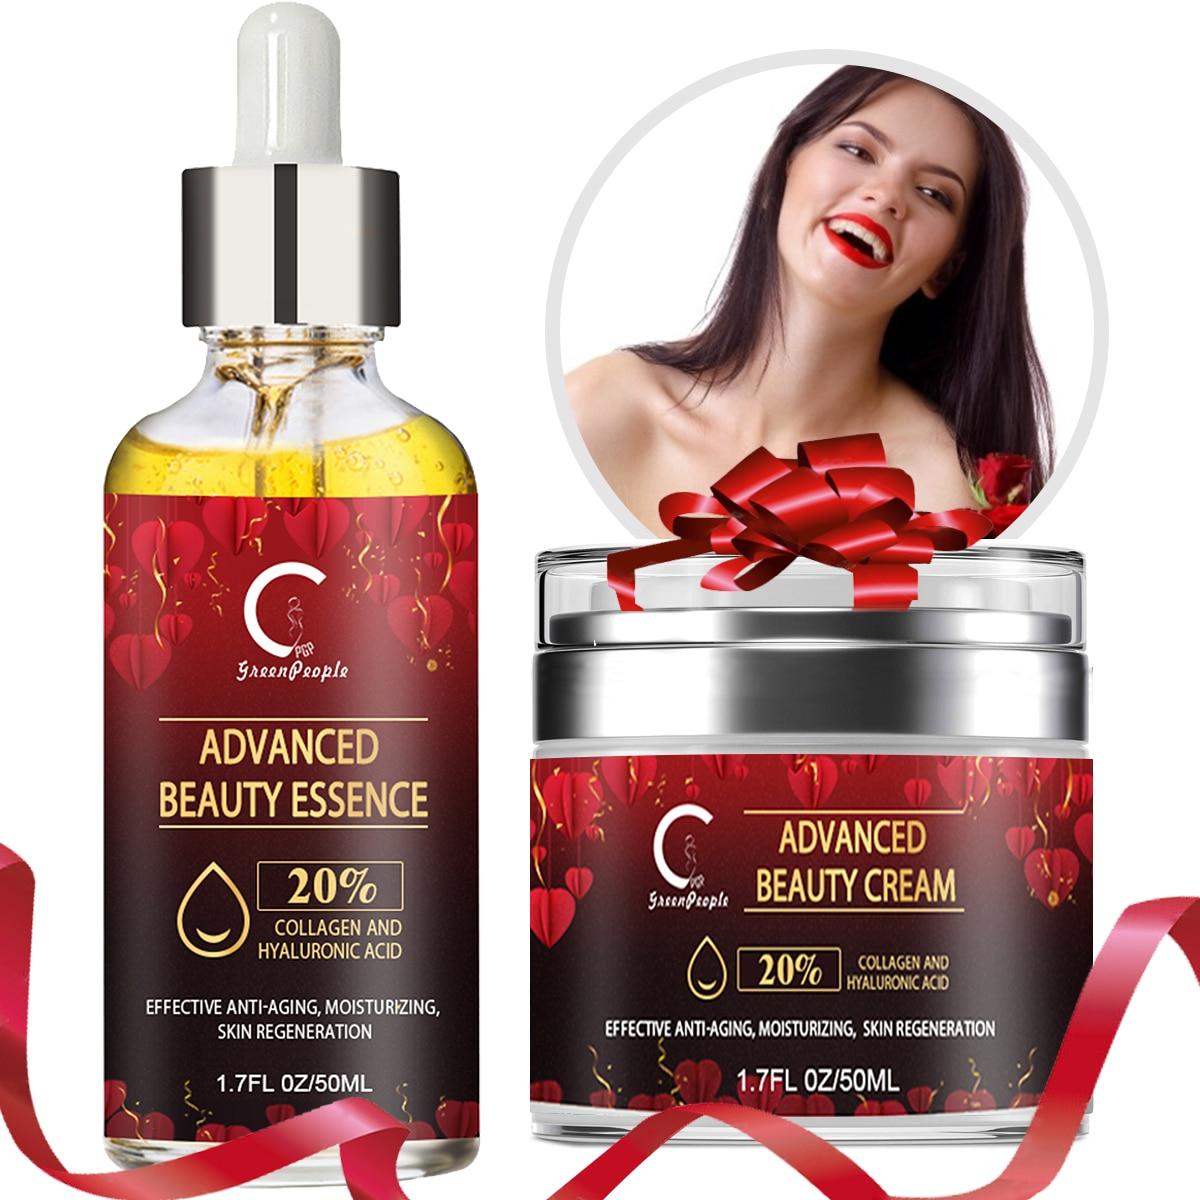 Face Serum Hyaluronic Acid Essence Valentine's Day Gift Anti-Aging Anti-Wrinkle Facial Moisturizing Cream Skin Care Product Set